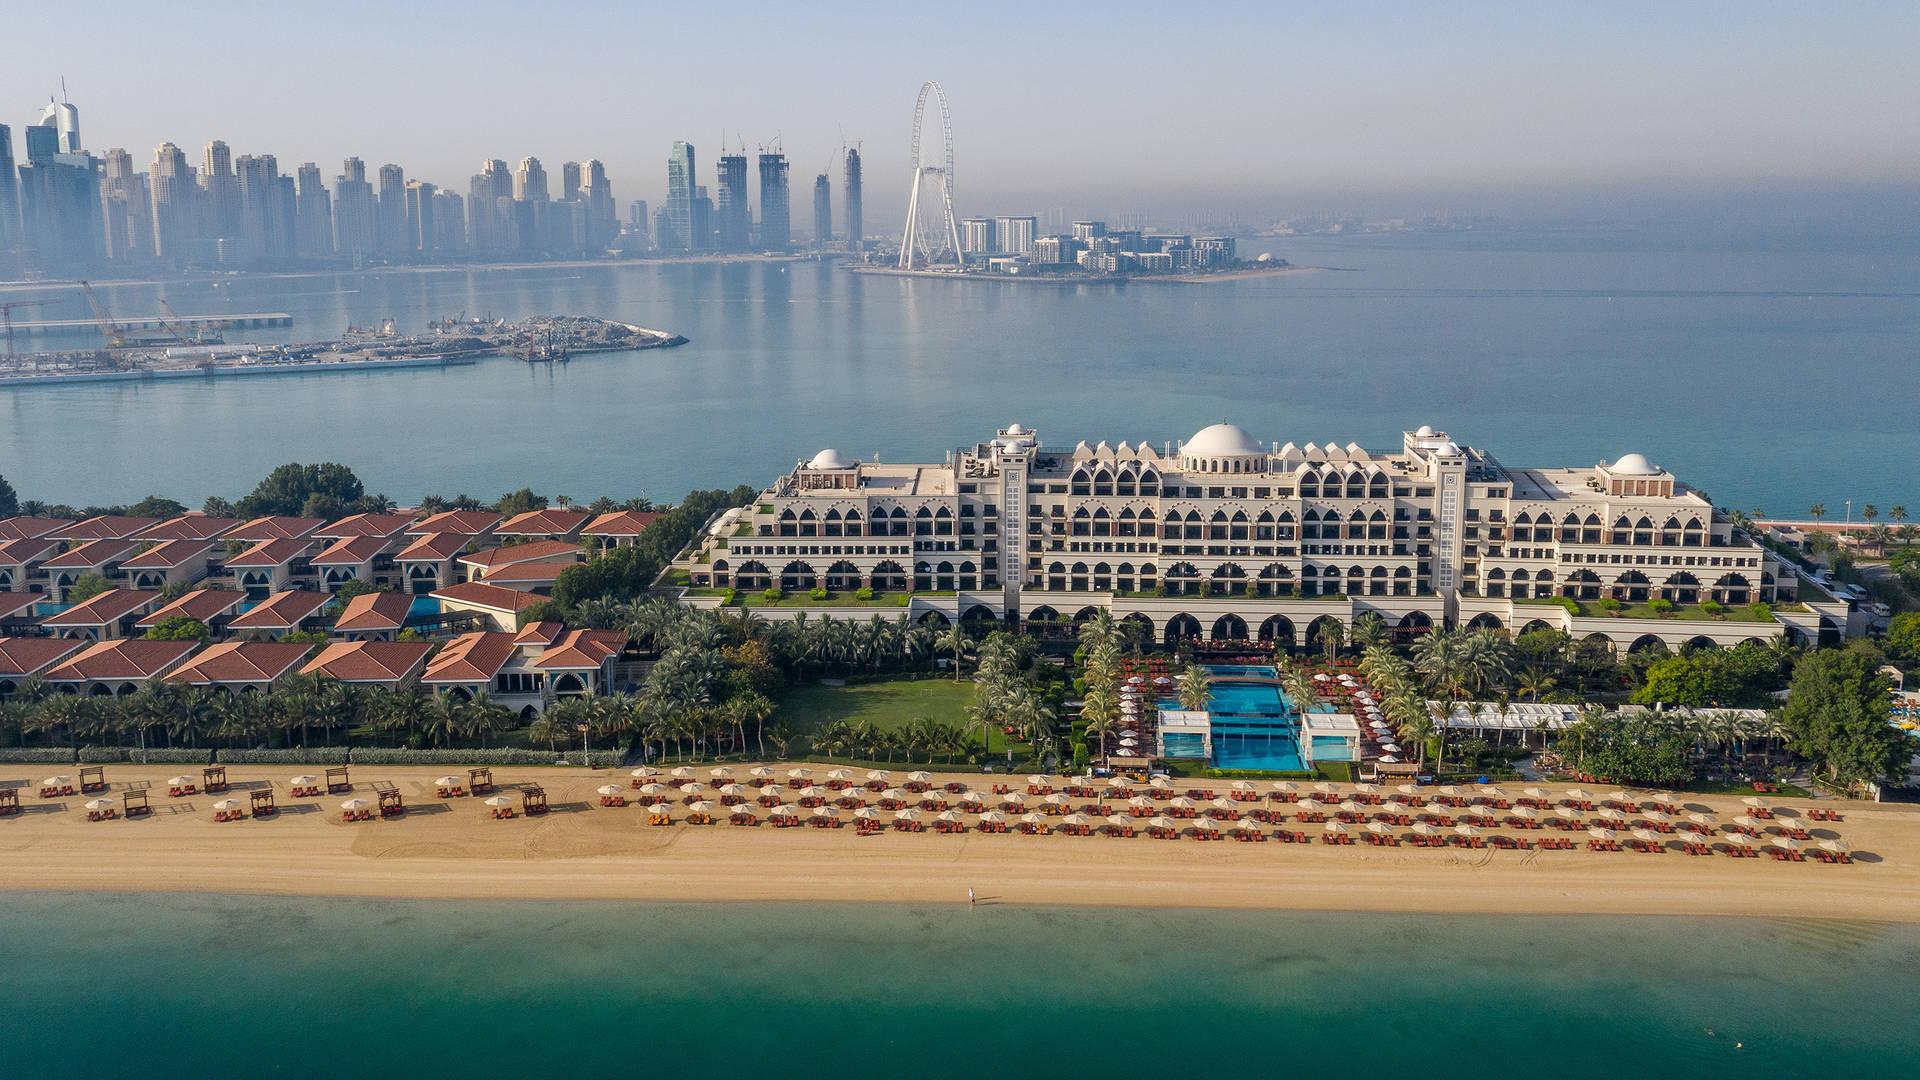 Beach view of Jumeirah Zabeel Saray in Dubai